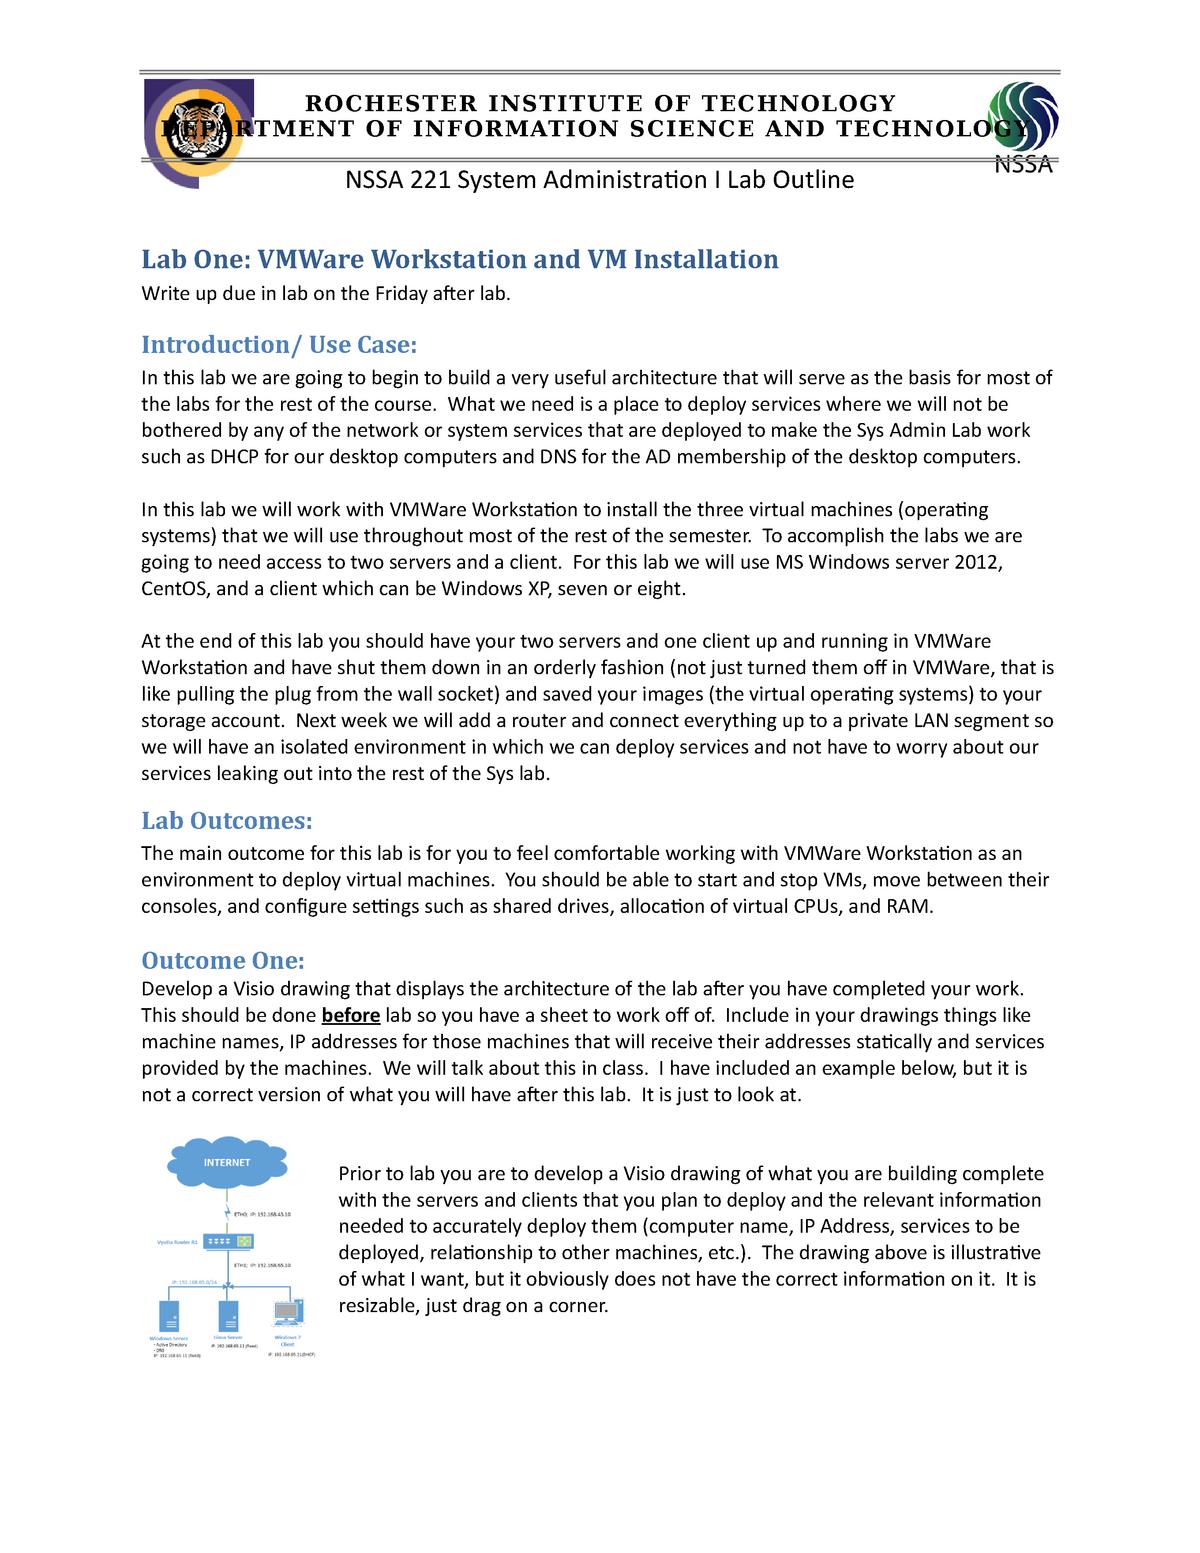 Lab 1 - 2015/2016 - 4050 421: Systems Admin I - StuDocu